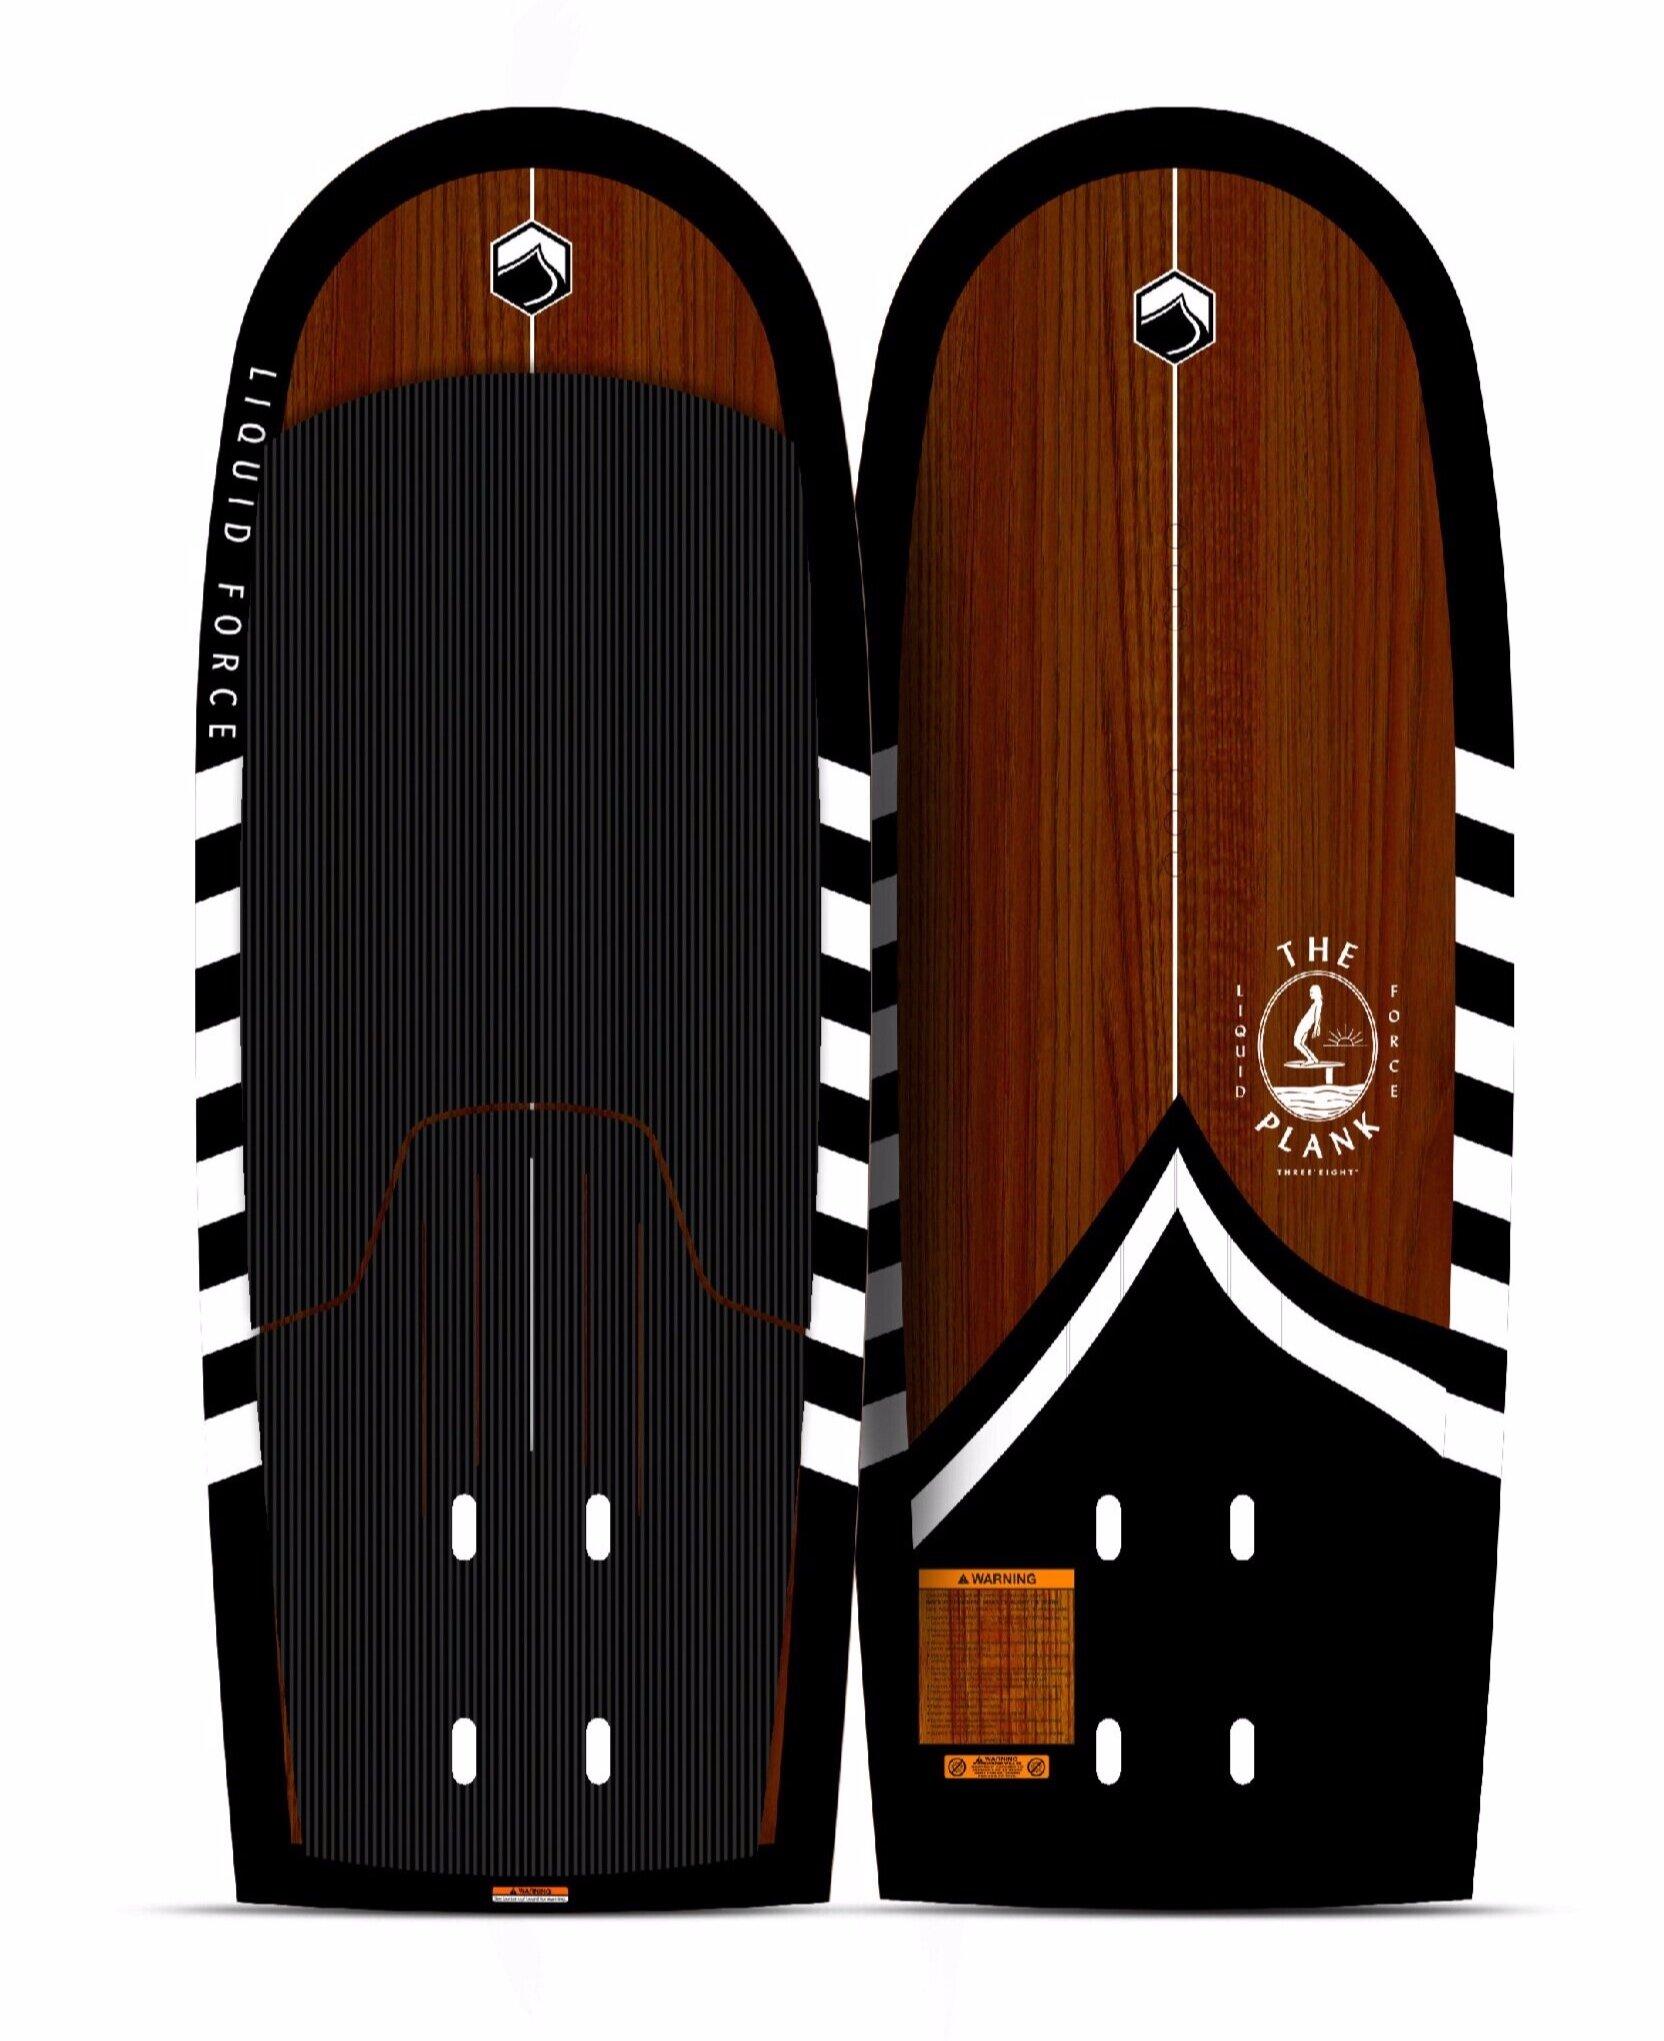 Plank-Product-Image-01.jpg